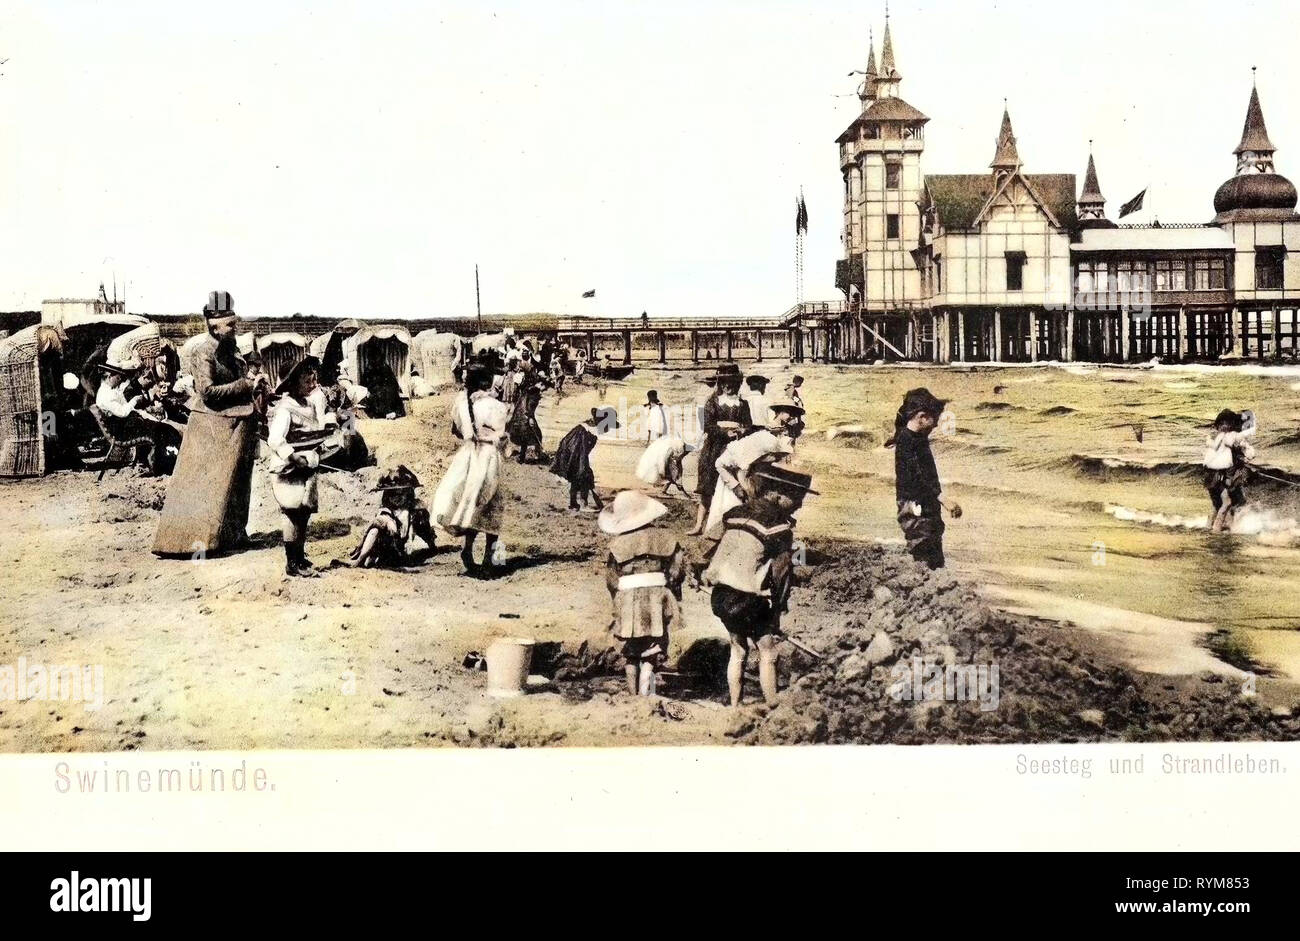 Piers in Poland, Beaches of Poland, Strandkorbs, Old, Świnoujście, 1903, West Pomeranian Voivodeship, Swinemünde, Seesteg und Strandleben Stock Photo